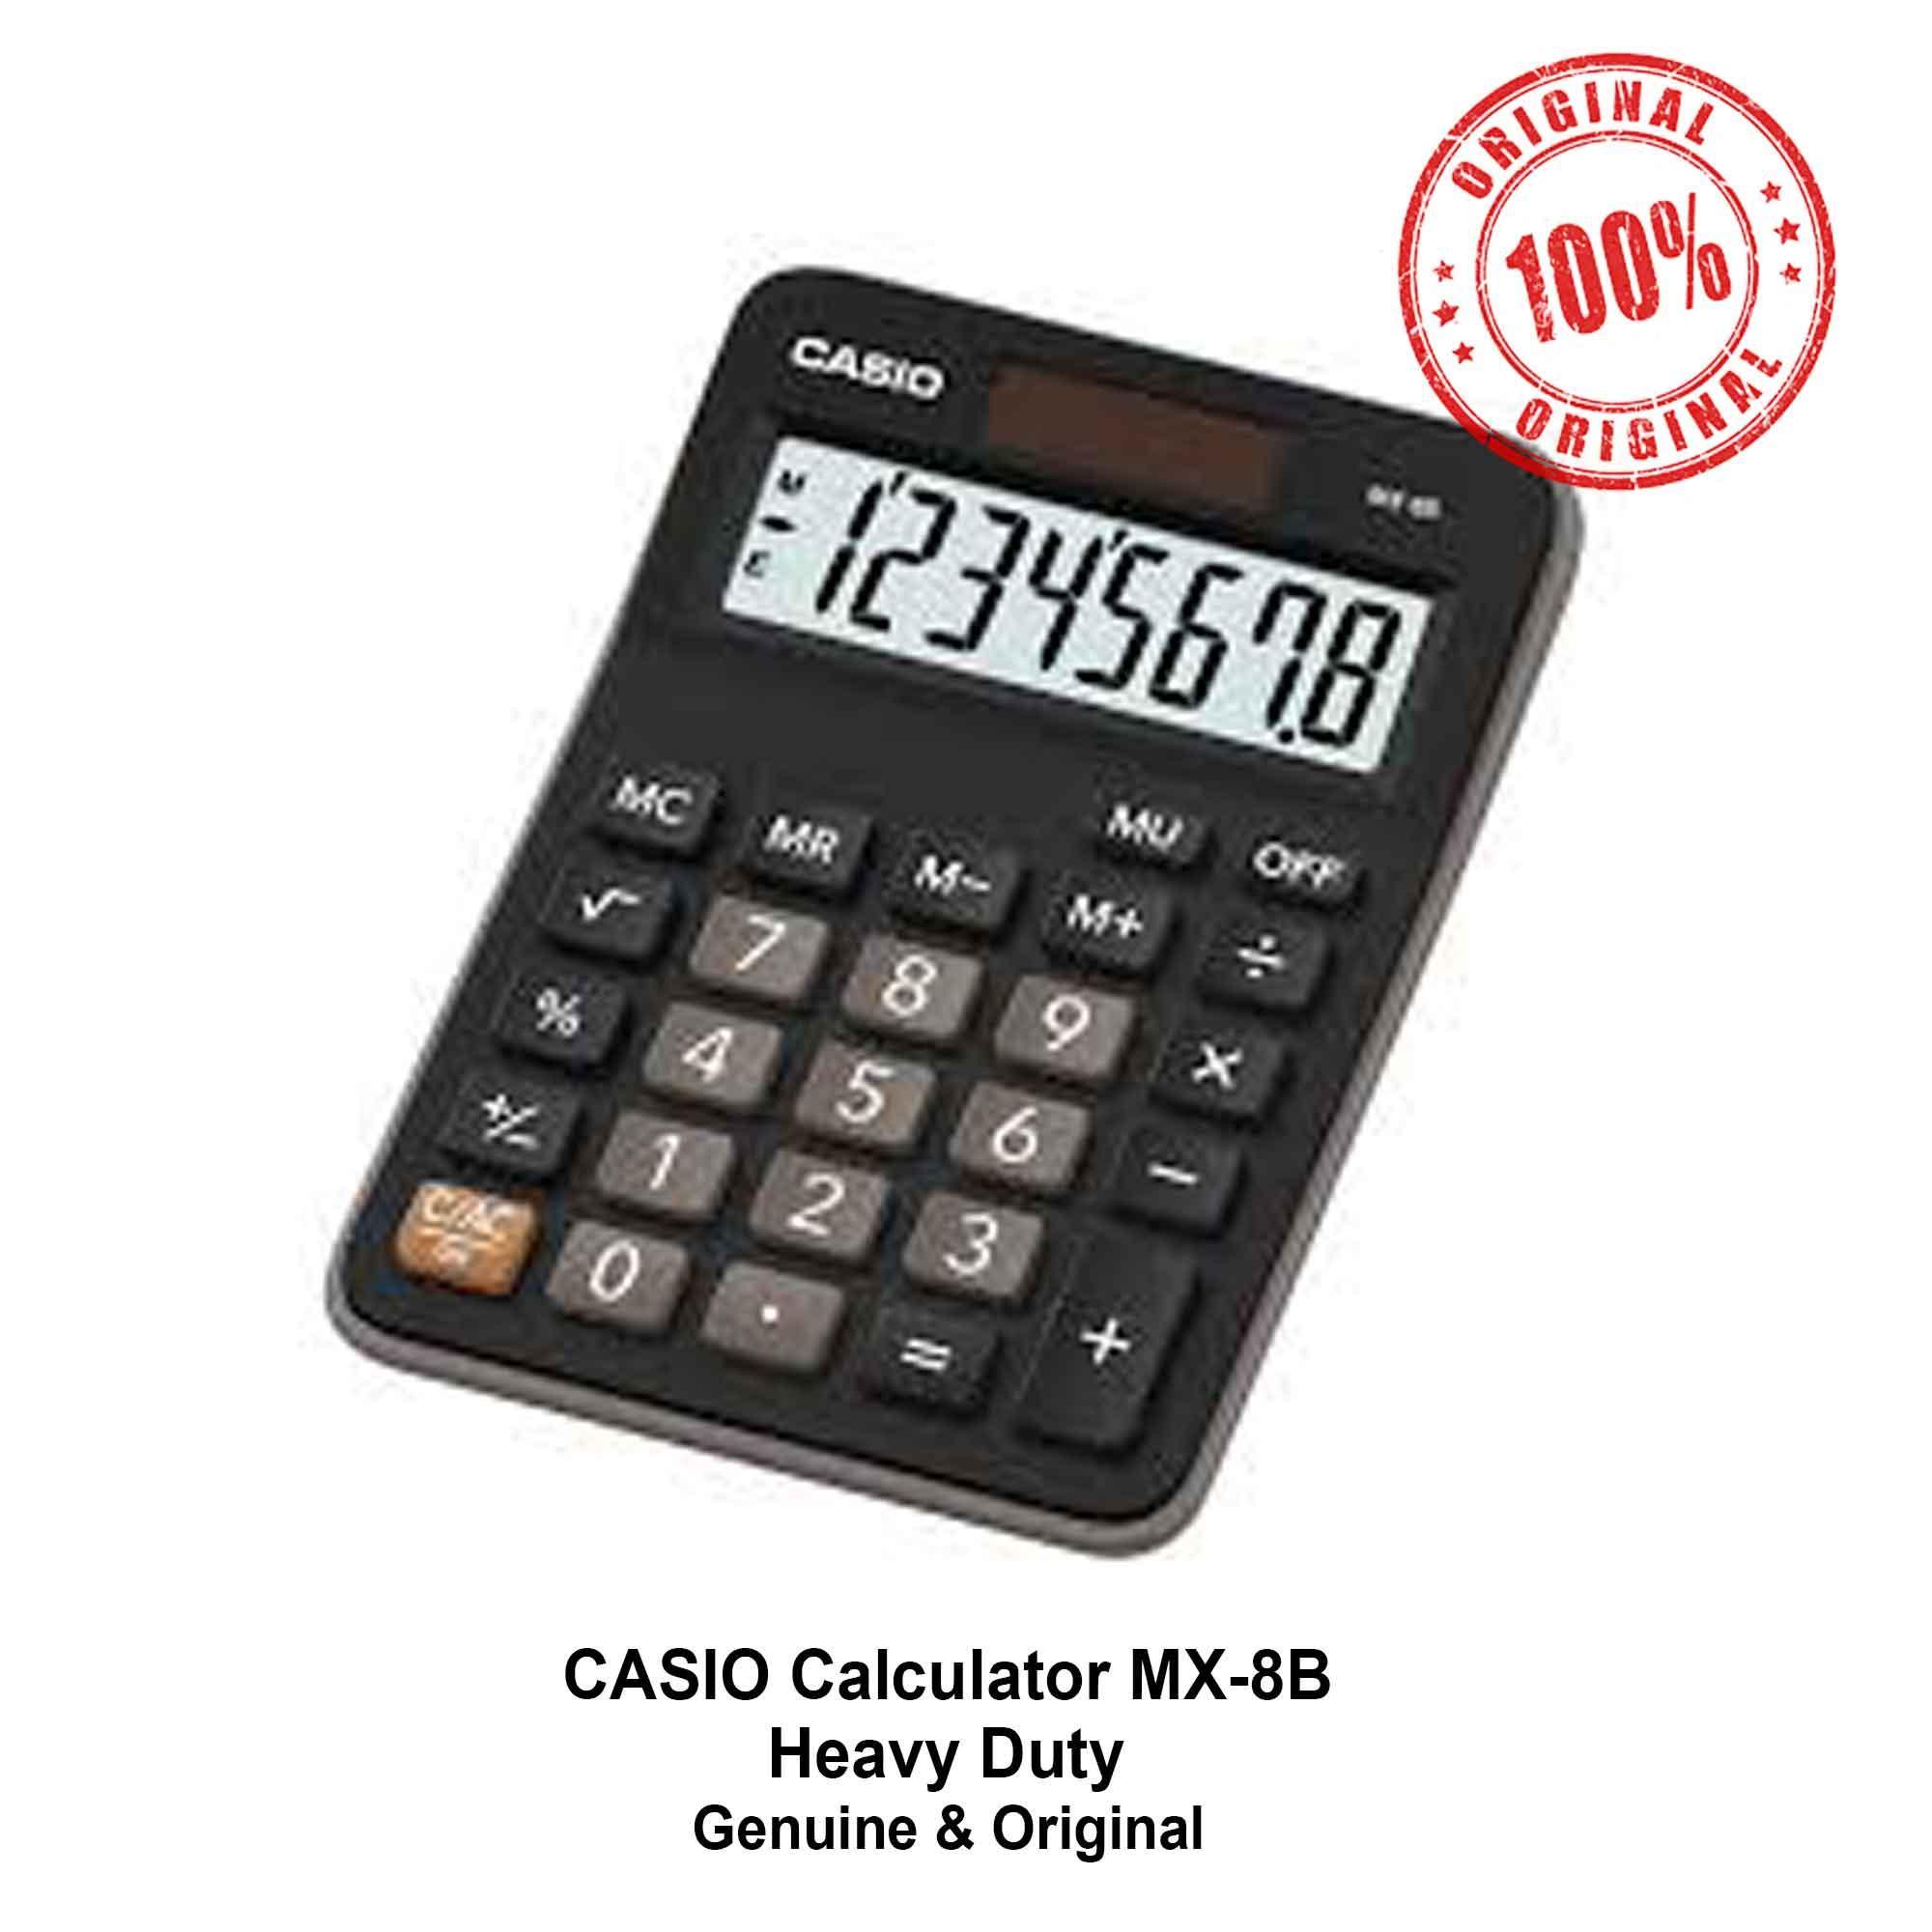 Casio Calculator MX-8B Calculators Heavy Duty MX8B - 1 Unit - Genuine and  Original